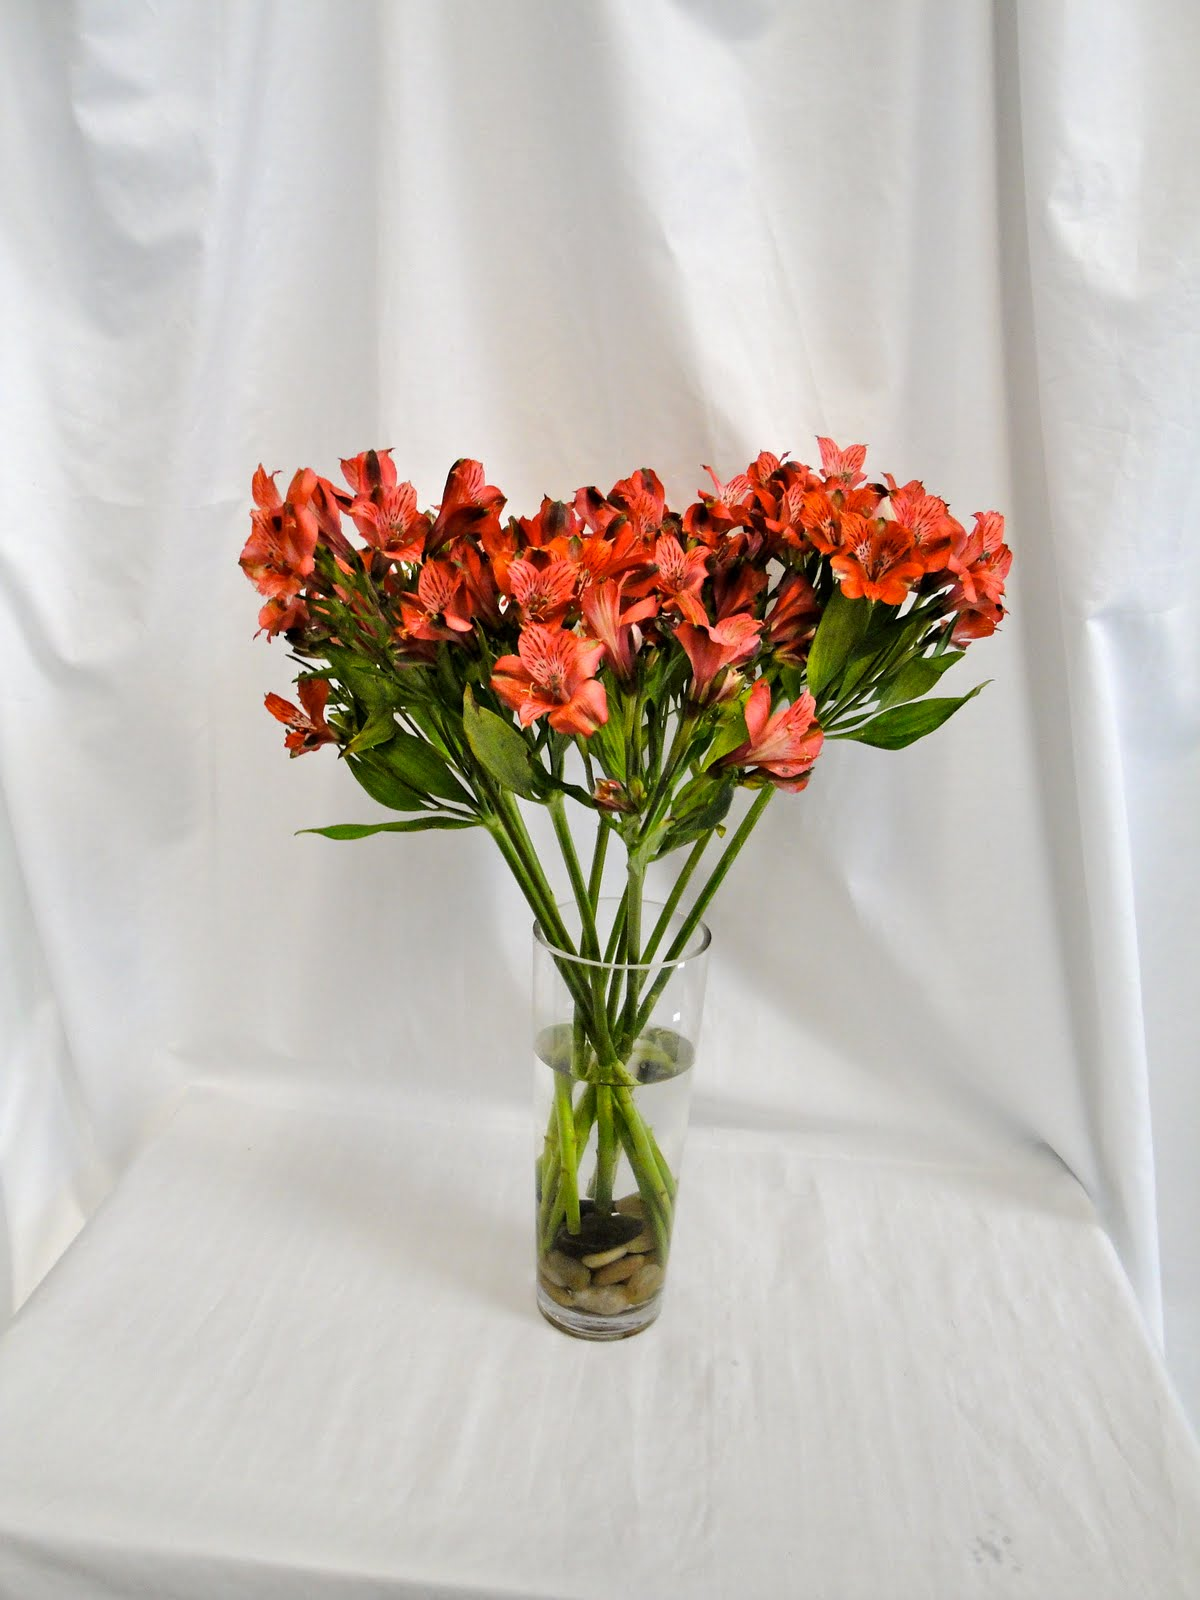 Bell Flowers Alstroemeria Test Day Twelve Bell Flowers Blog